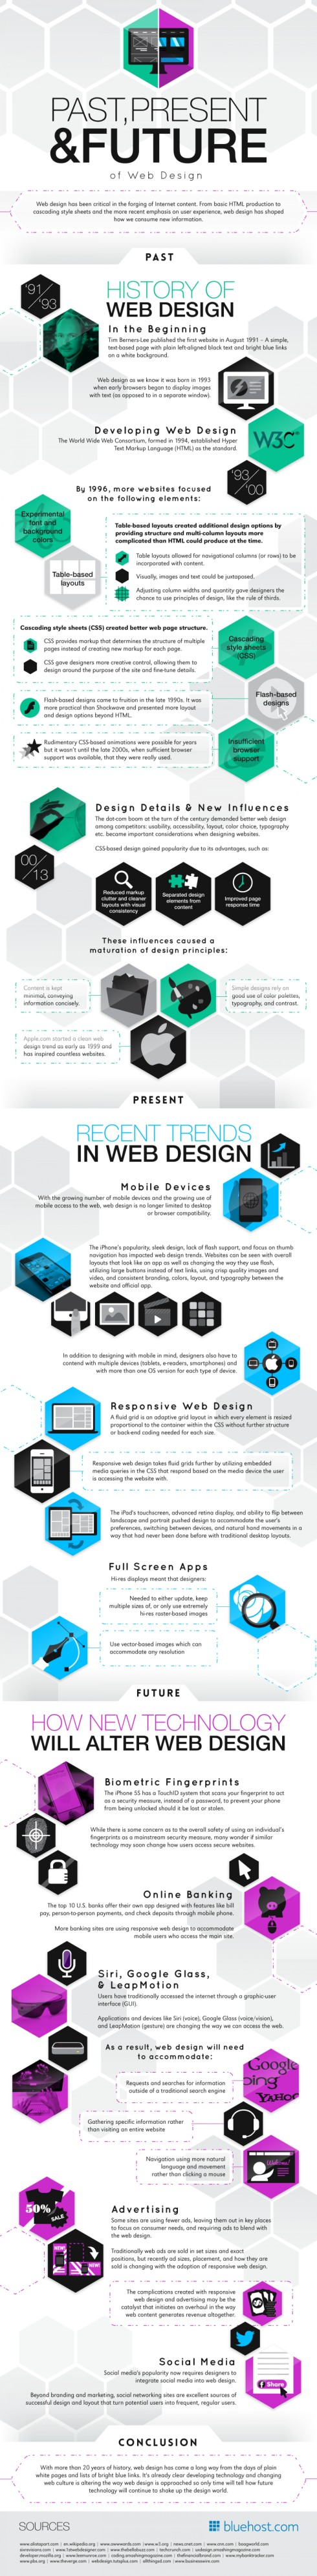 past-present-and-future-of-web-design